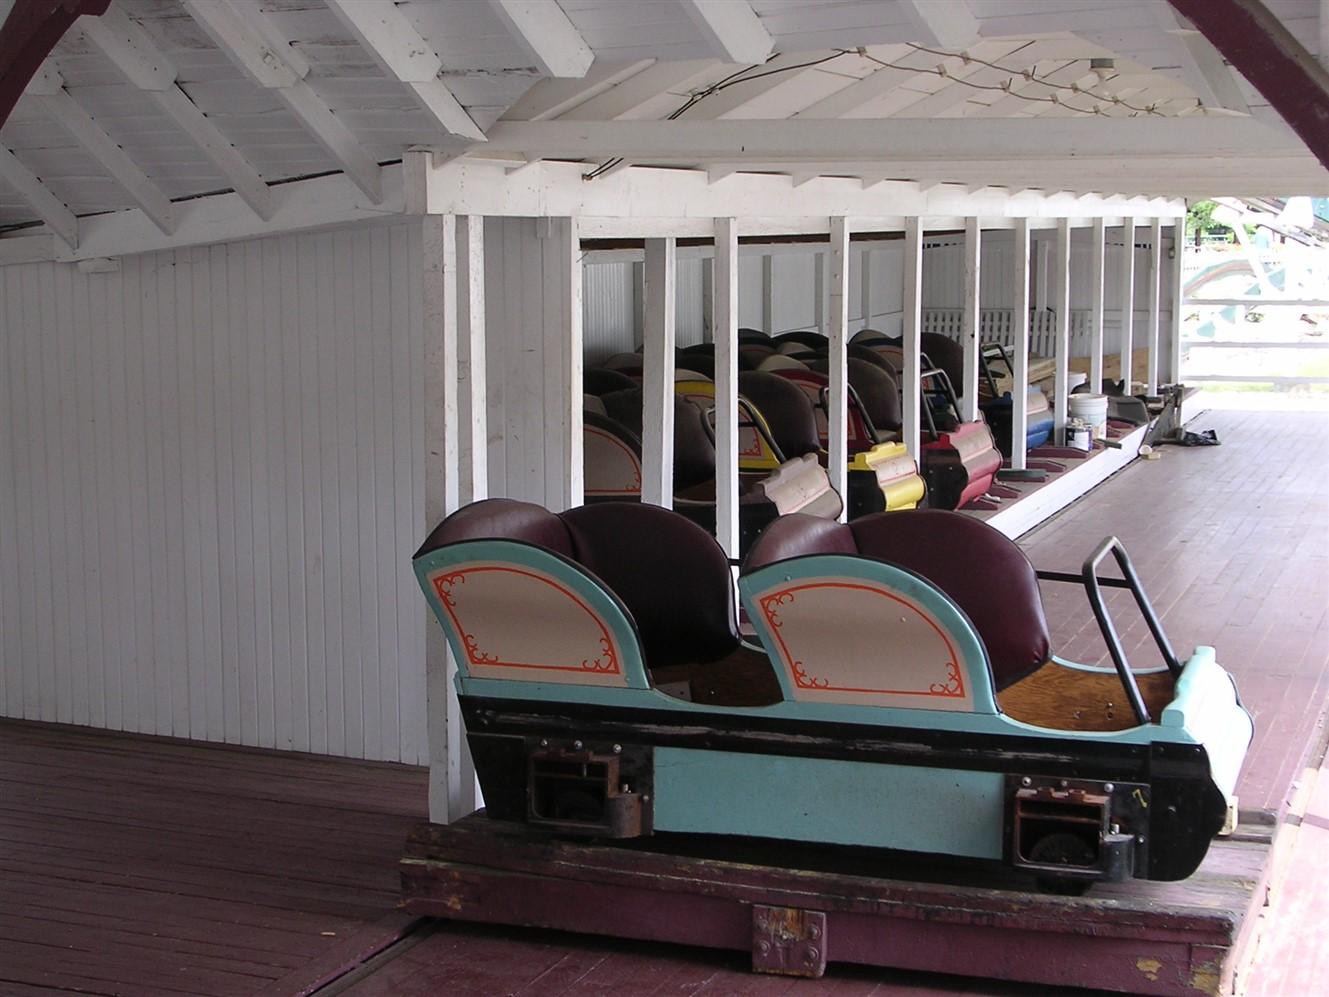 2004 07 03 Altoona PA Lakemont Park 40